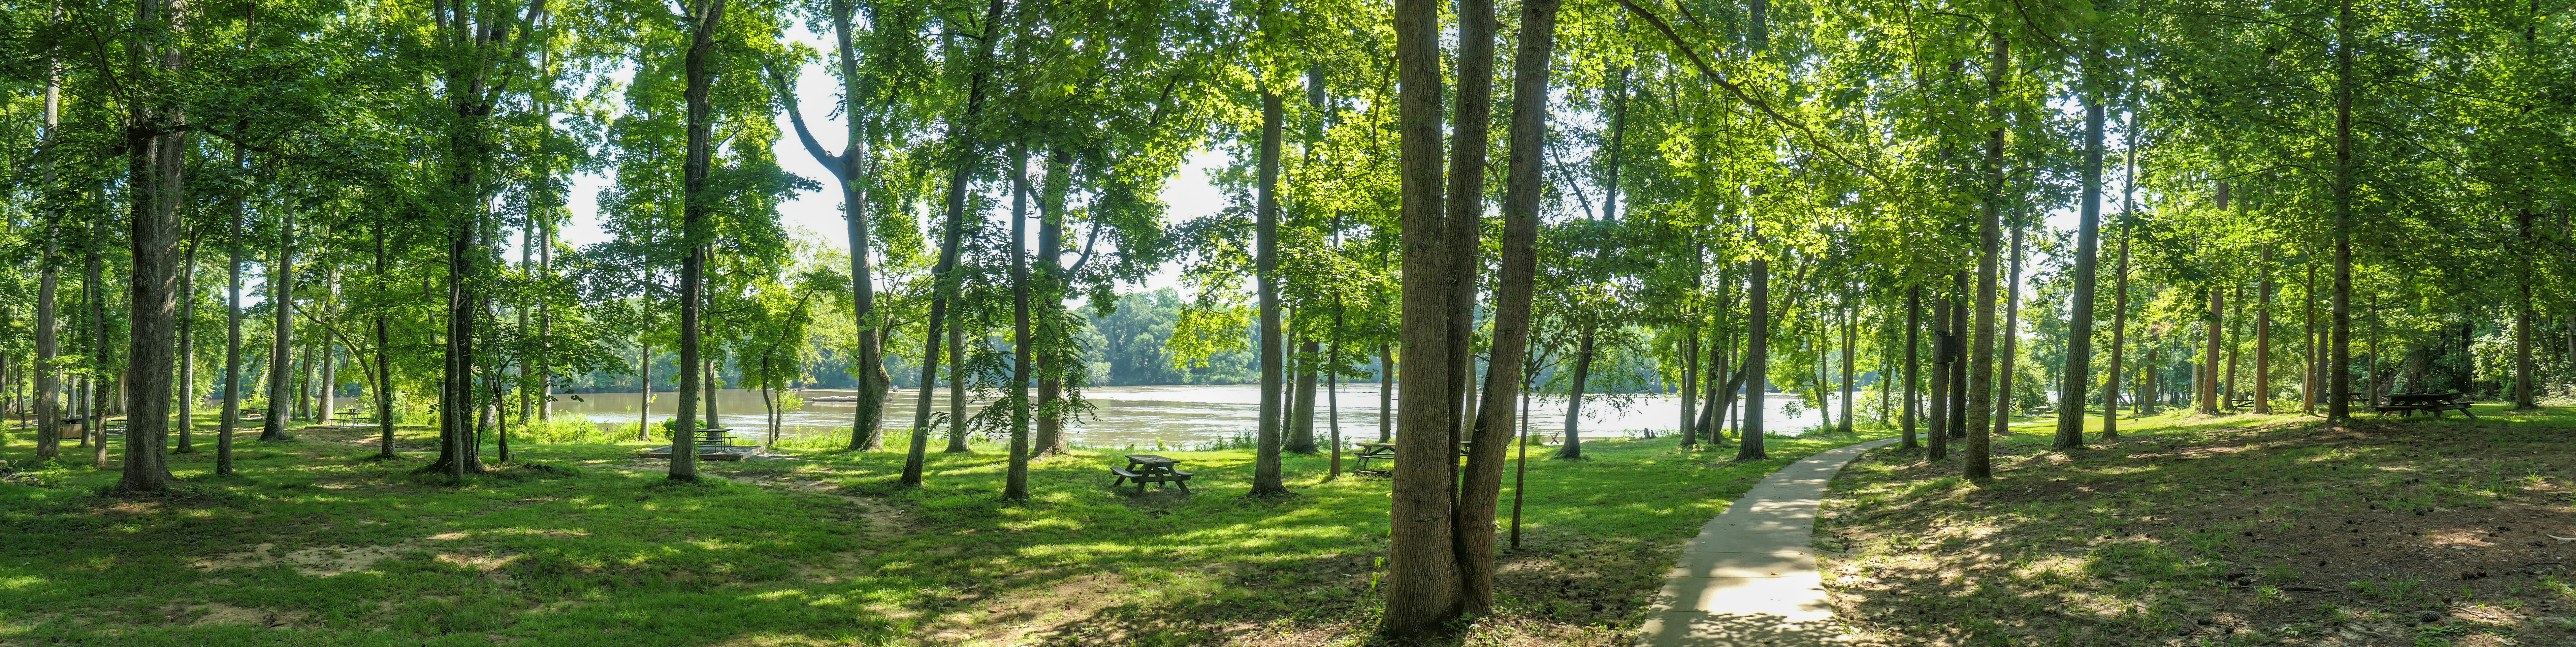 picnic area river.jpg